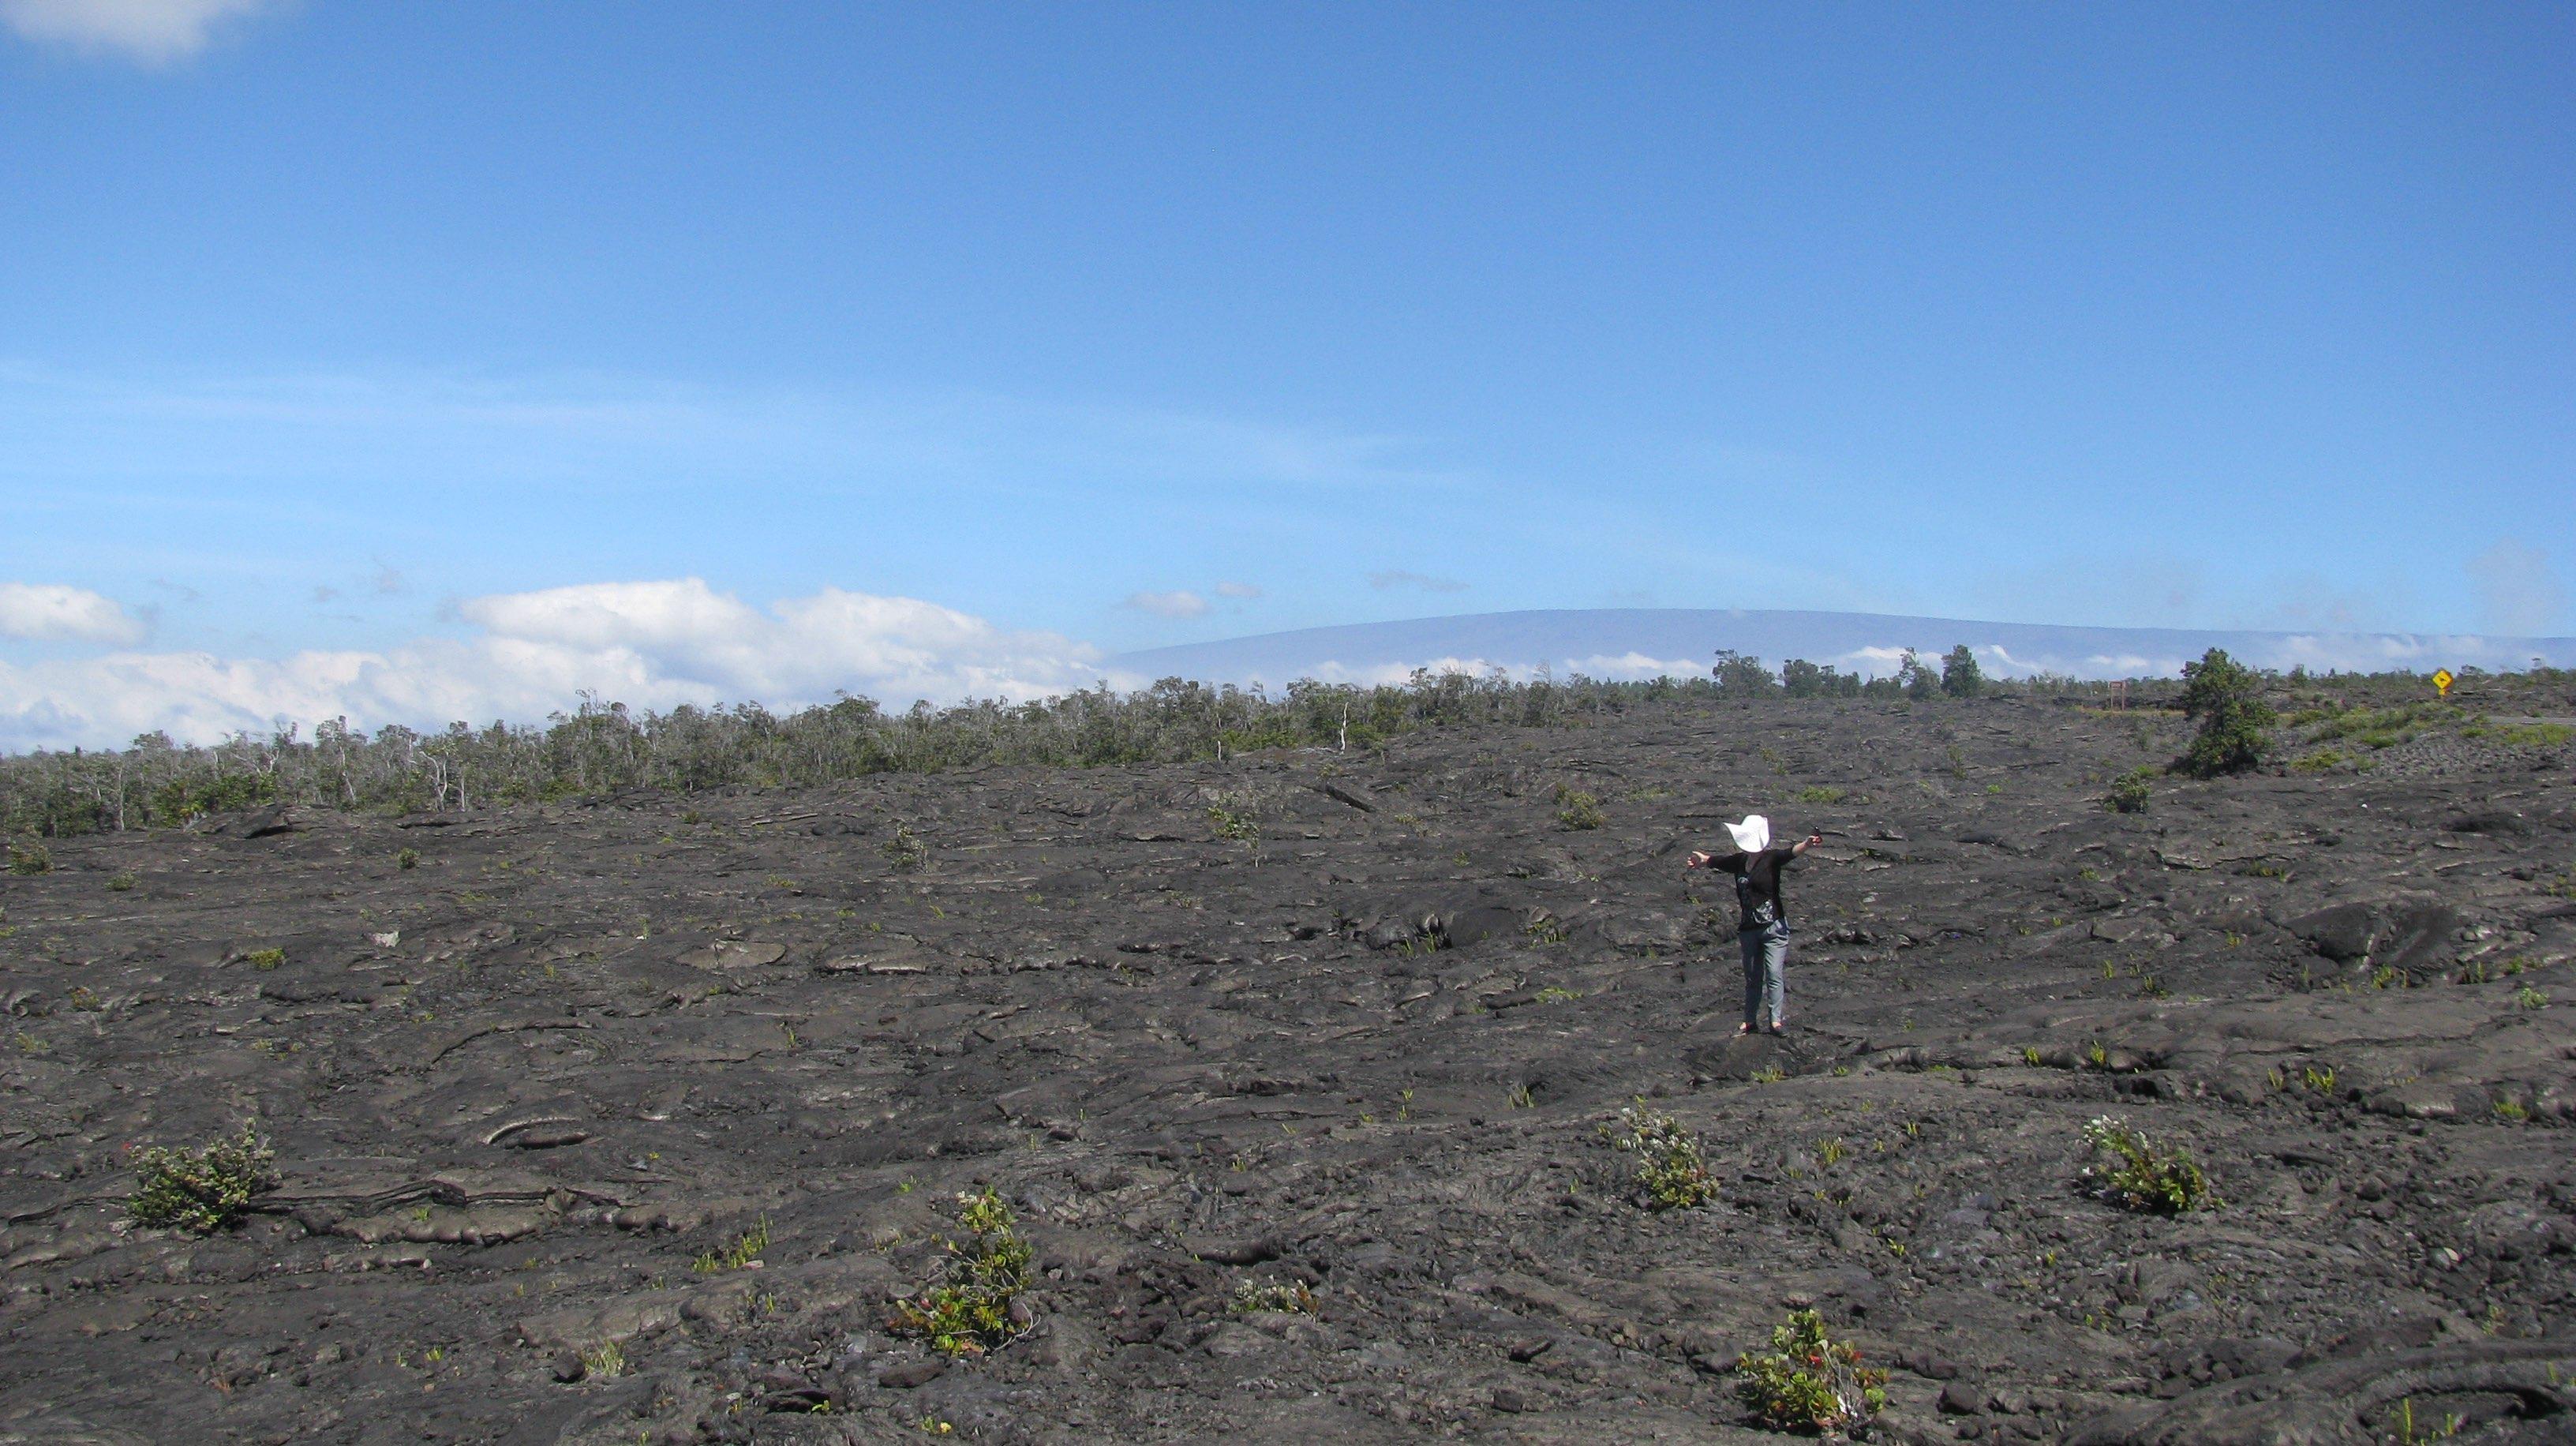 Hawaii volcanoes national park lost land